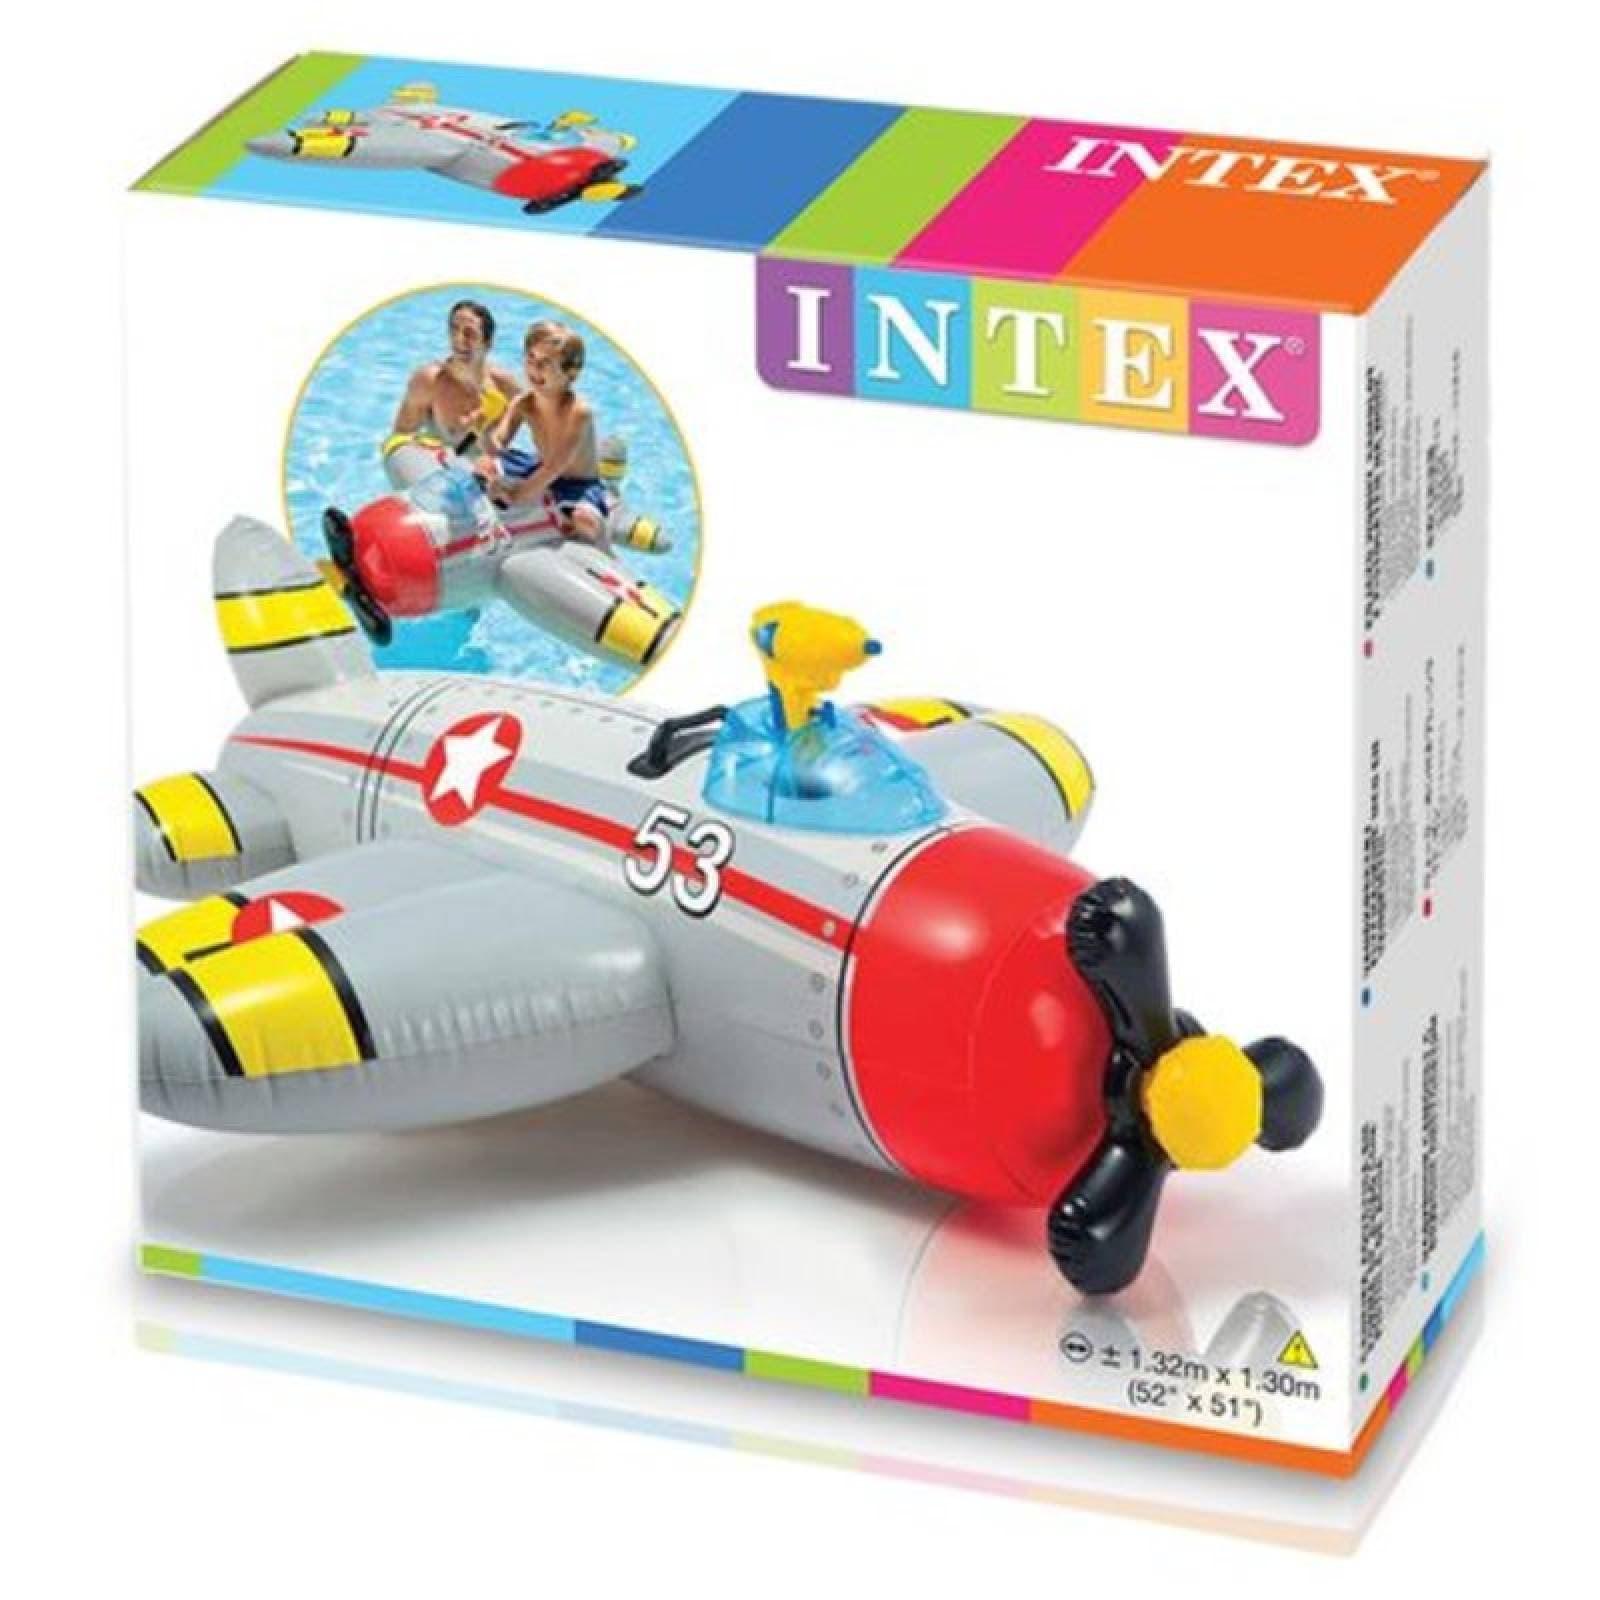 Avion Inflable Con Pistola De Agua  52x51x36 57537Np Intex